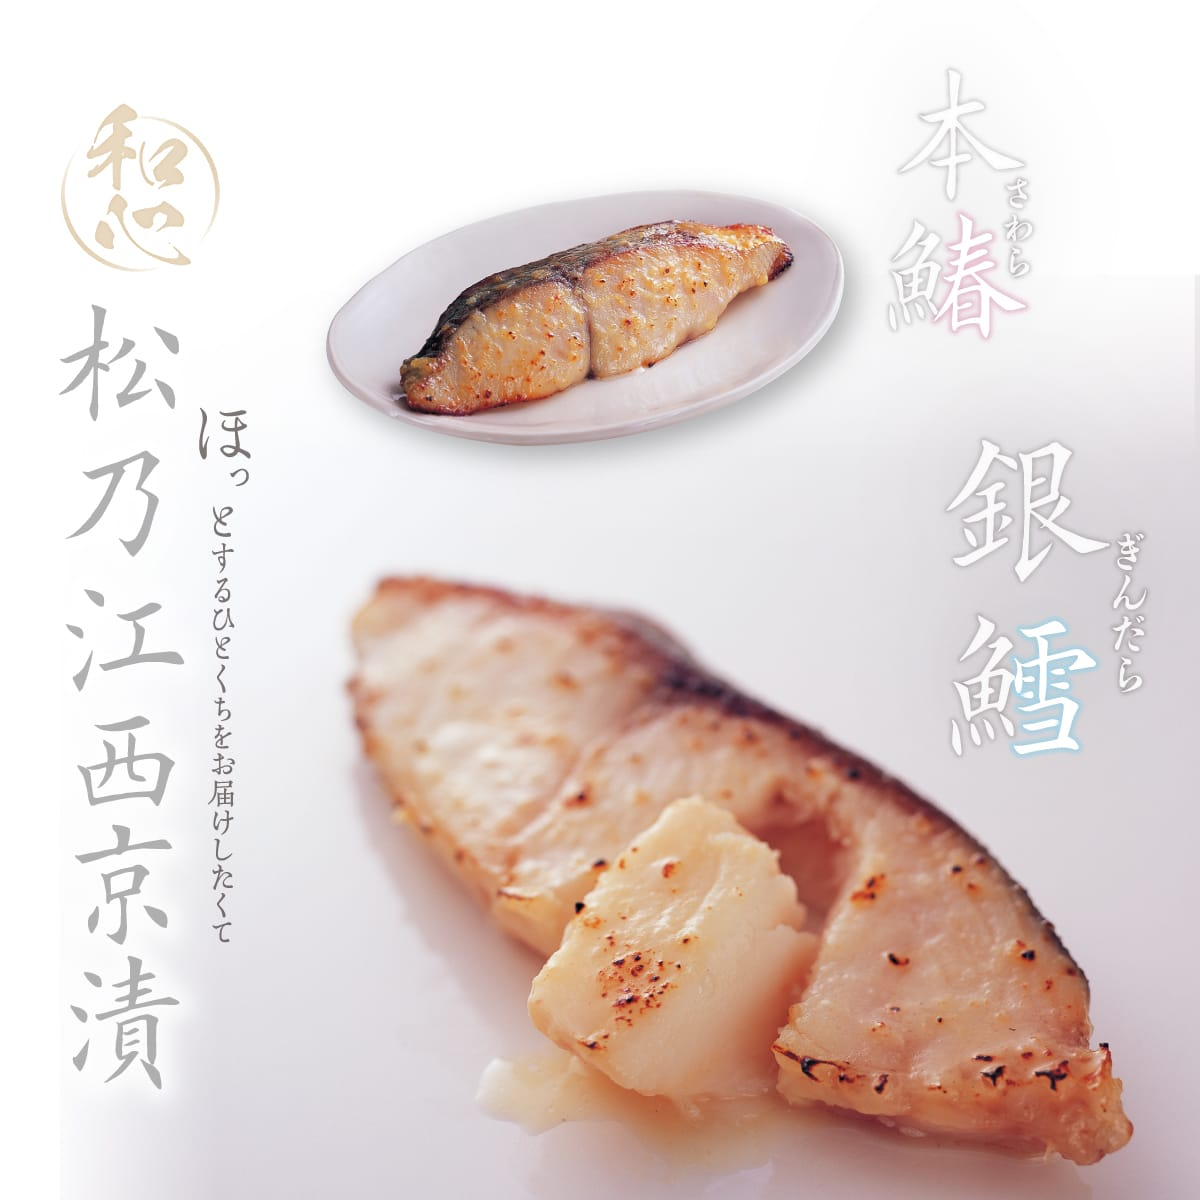 松乃江特選 銀鱈・本鰆西京漬詰合せ